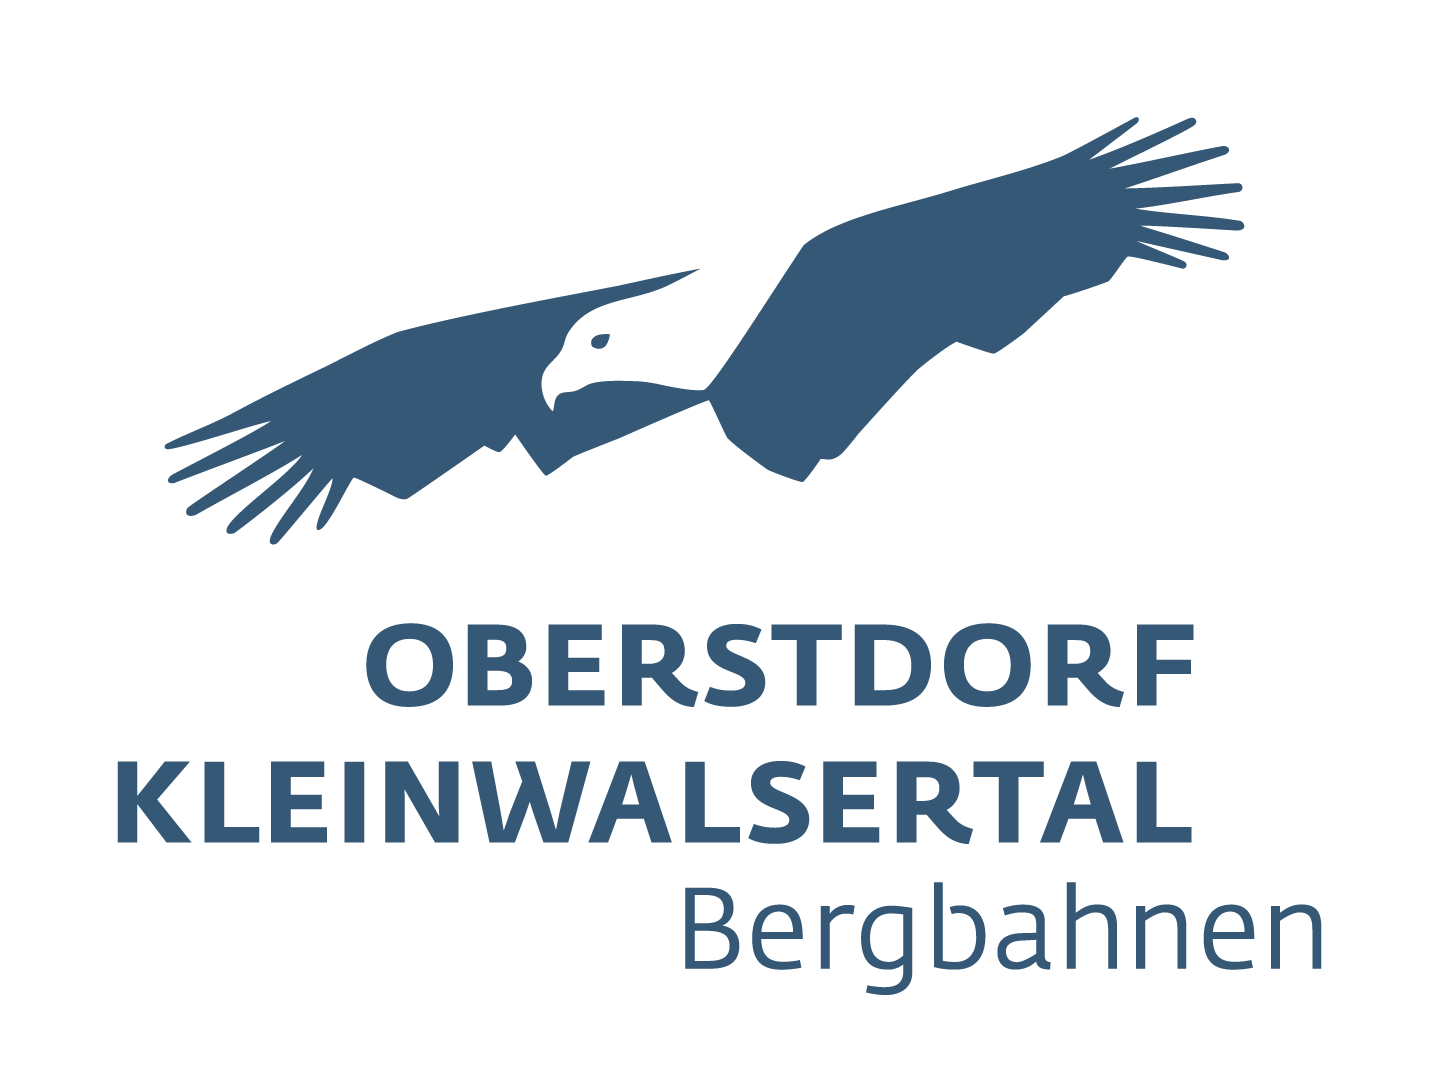 OBERSTDORF - KLEINWALSERTAL BERGBAHNEN